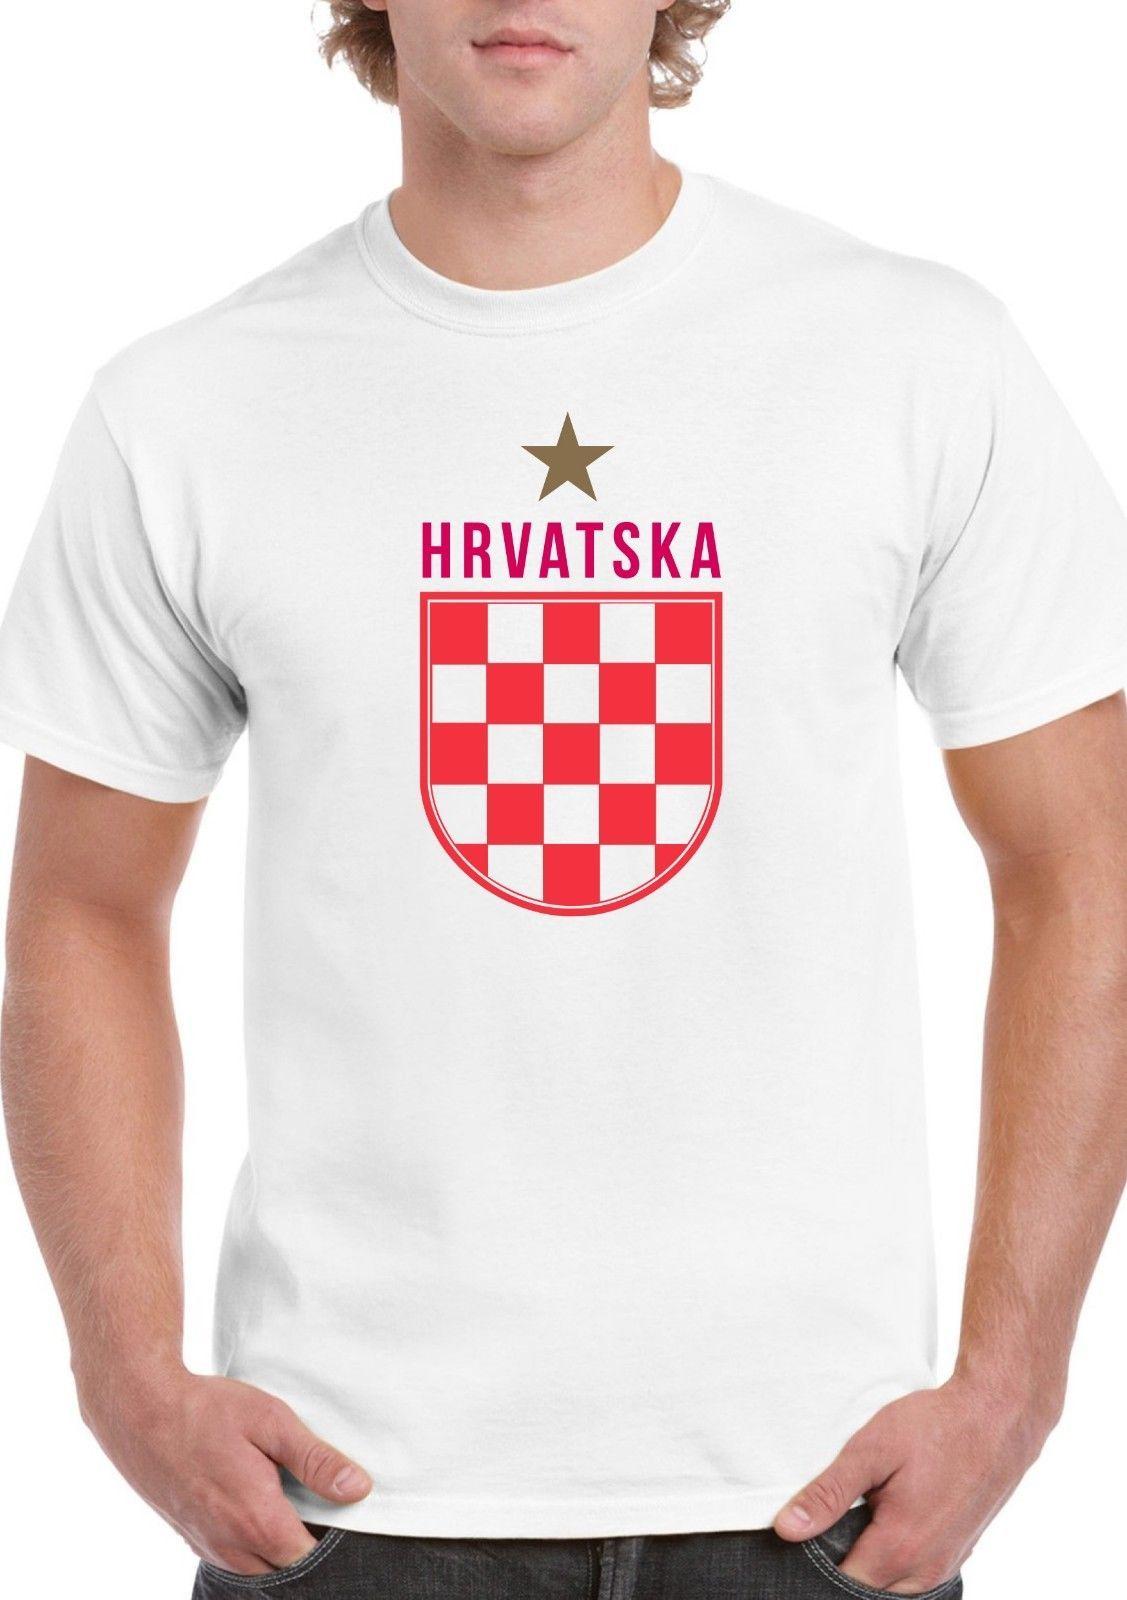 beb7c2ba846d Hrvatska Gold Star T Shirt Croatian Red White Croatia World Cup Winners  2018 Funny Unisex Latest Designer T Shirts Coolest Tees From Pickapair, ...